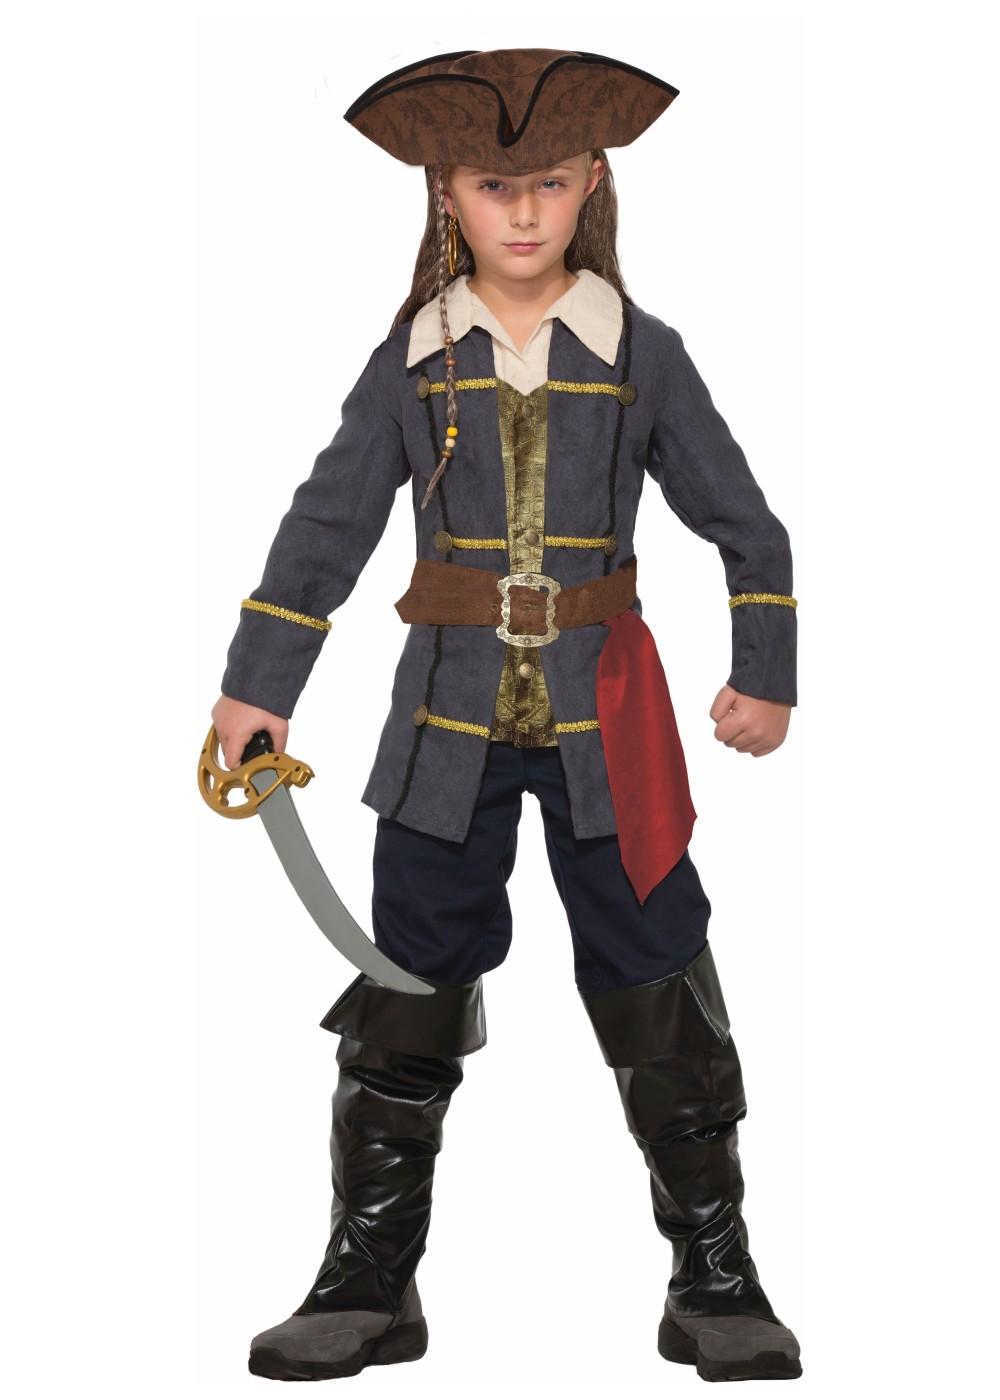 Pirate Captain Boys Costume Pirate Costumes